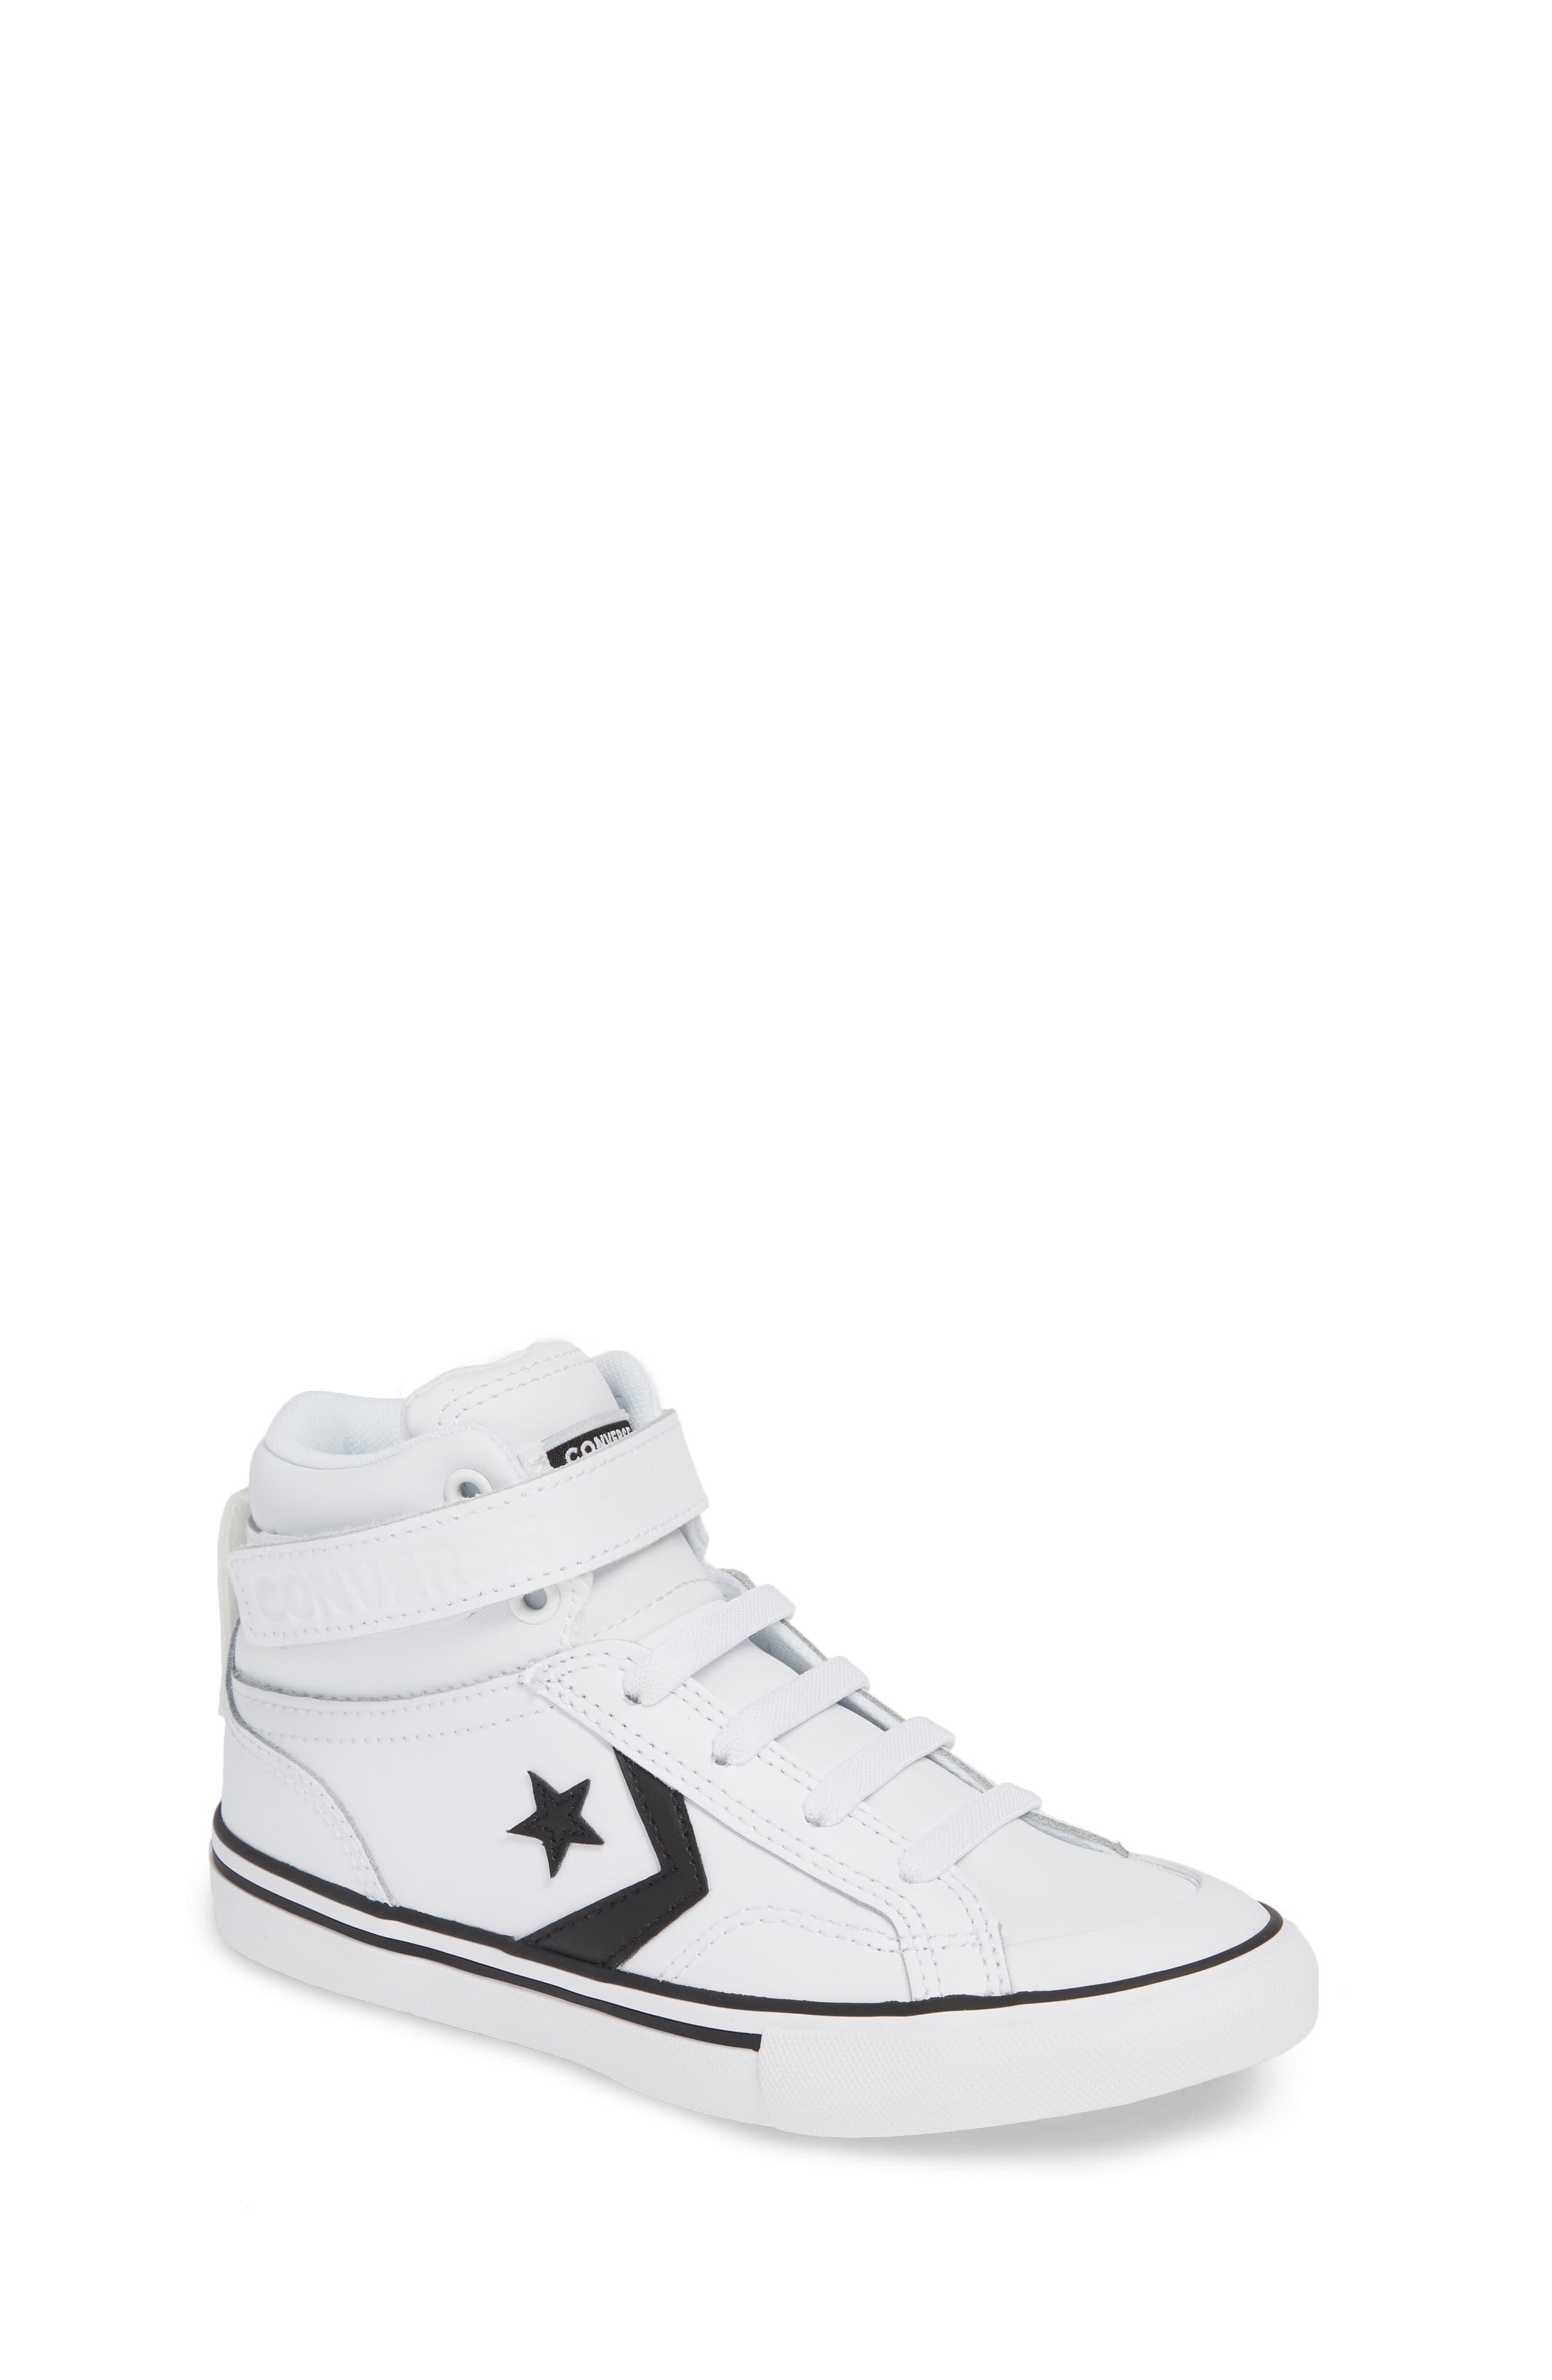 CONVERSE Pro Blaze High Top Sneaker, Main, color, WHITE/ BLACK/ WHITE